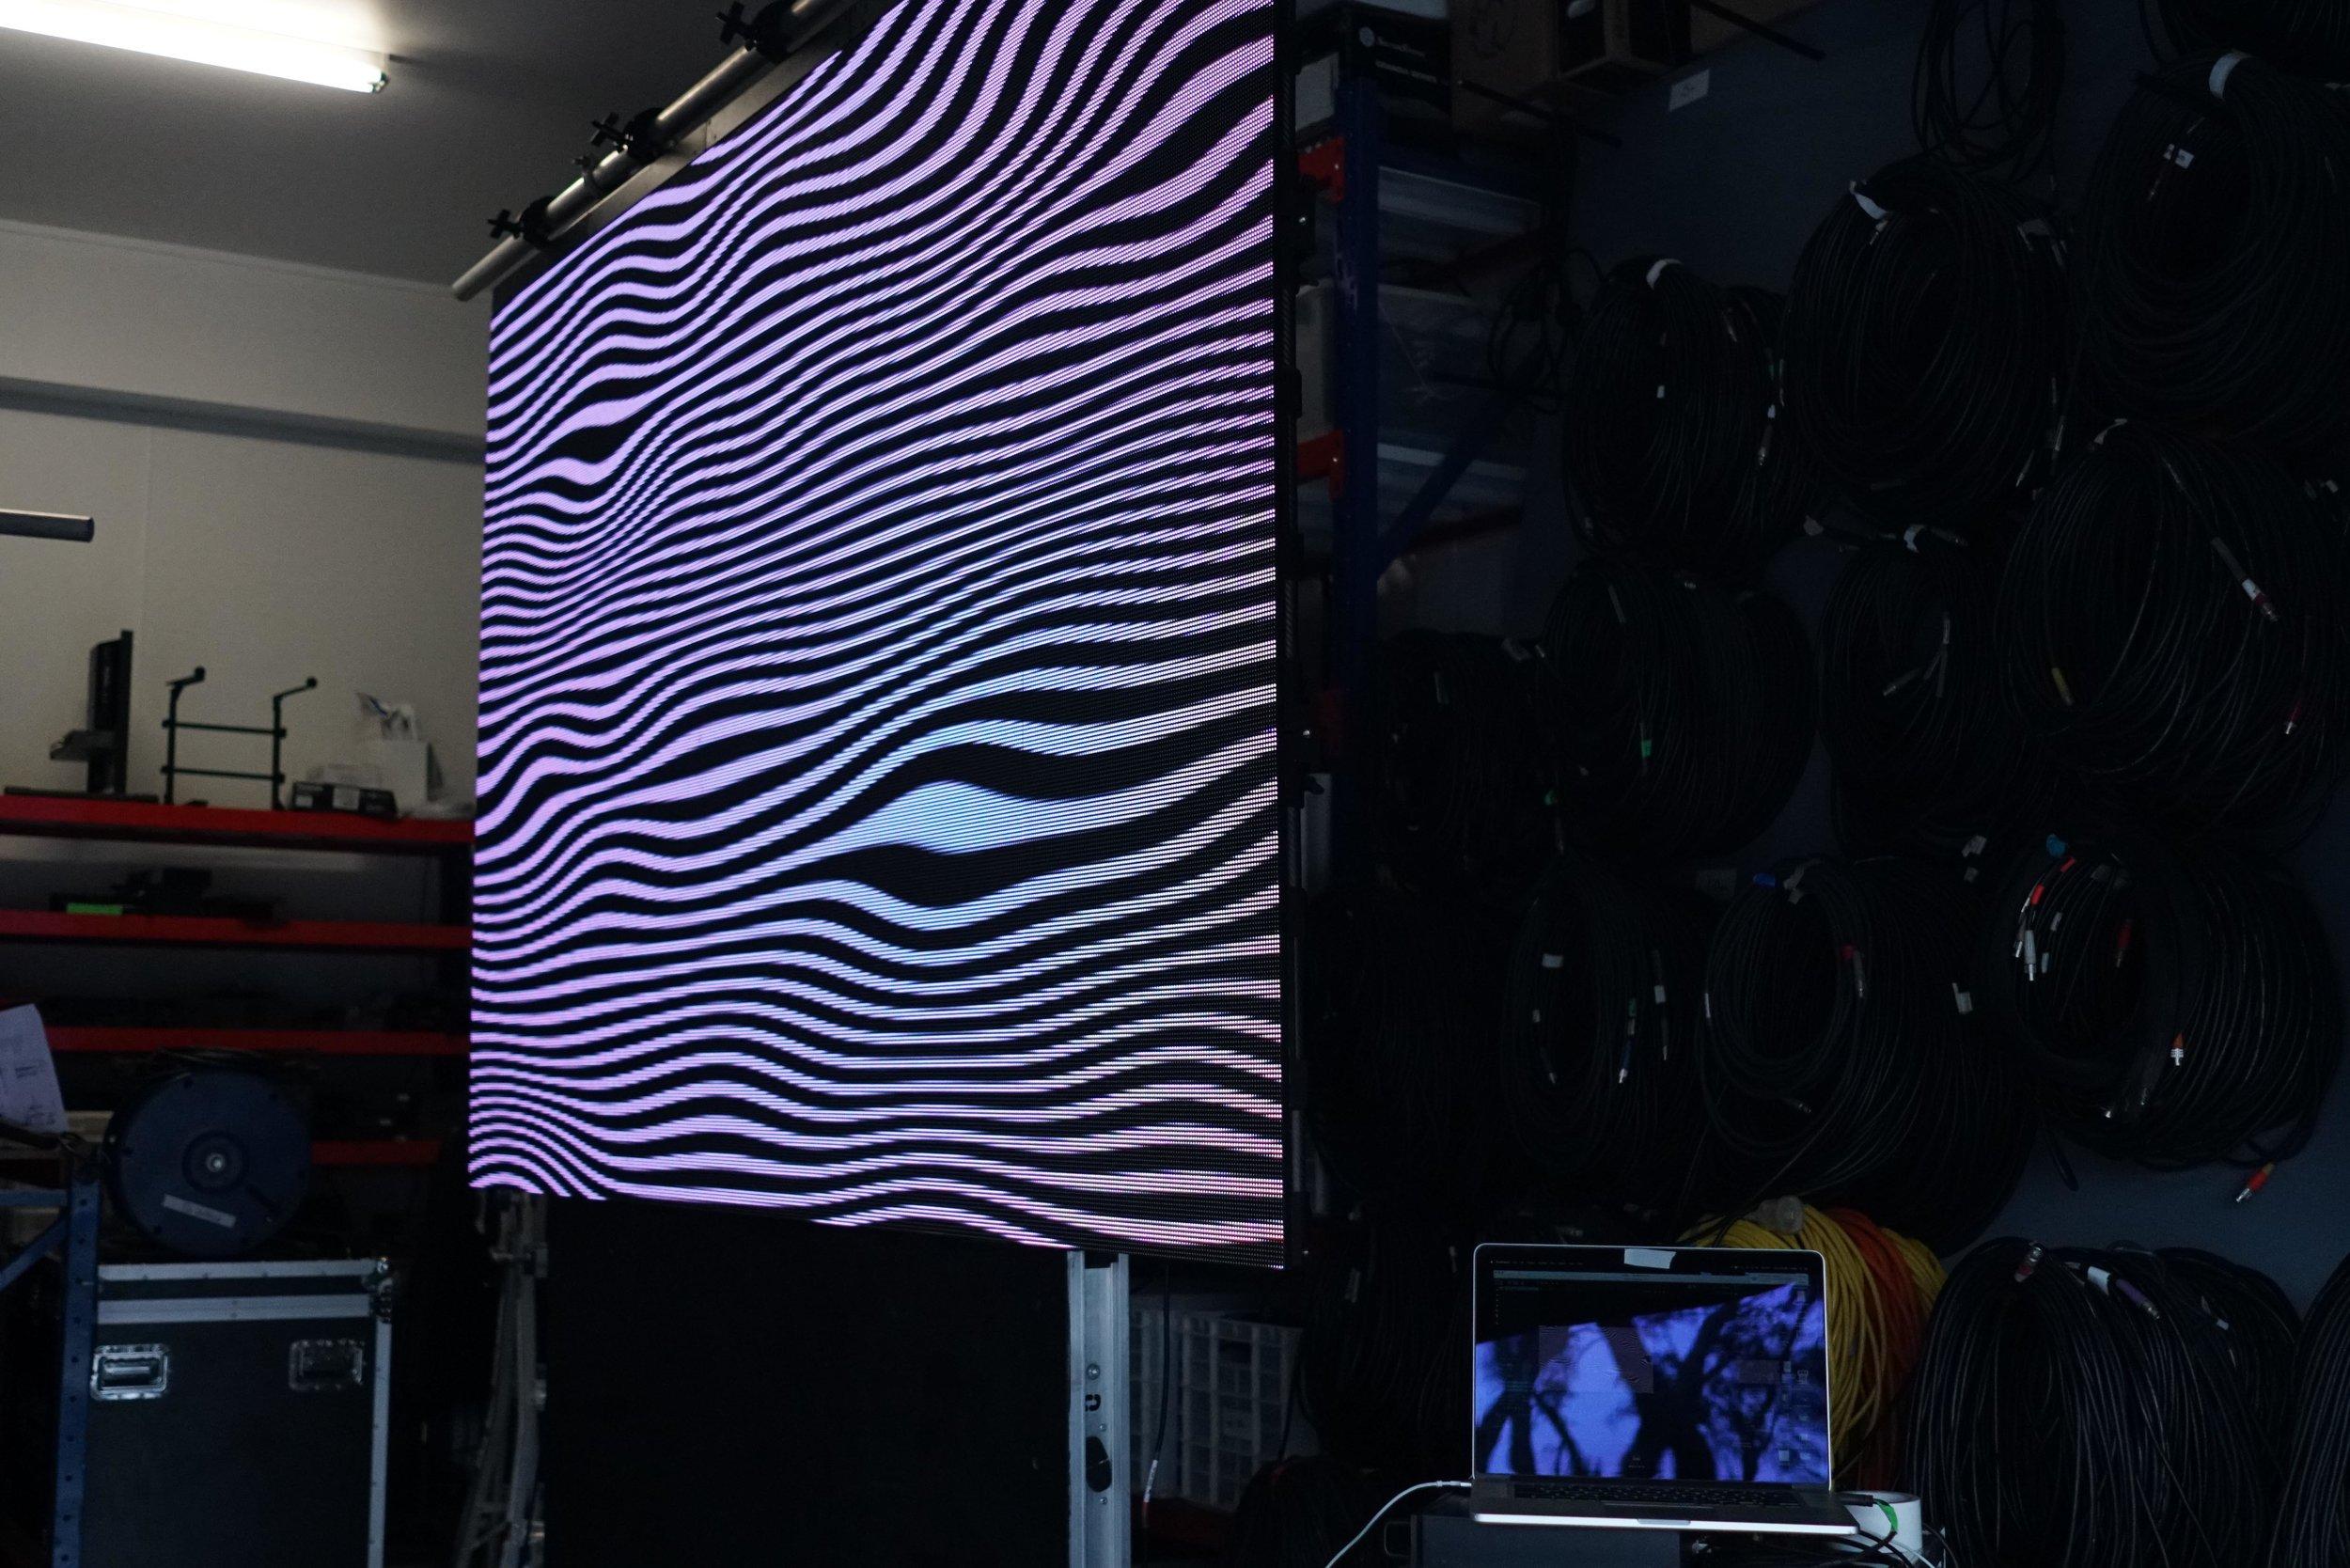 LED panel A.jpg